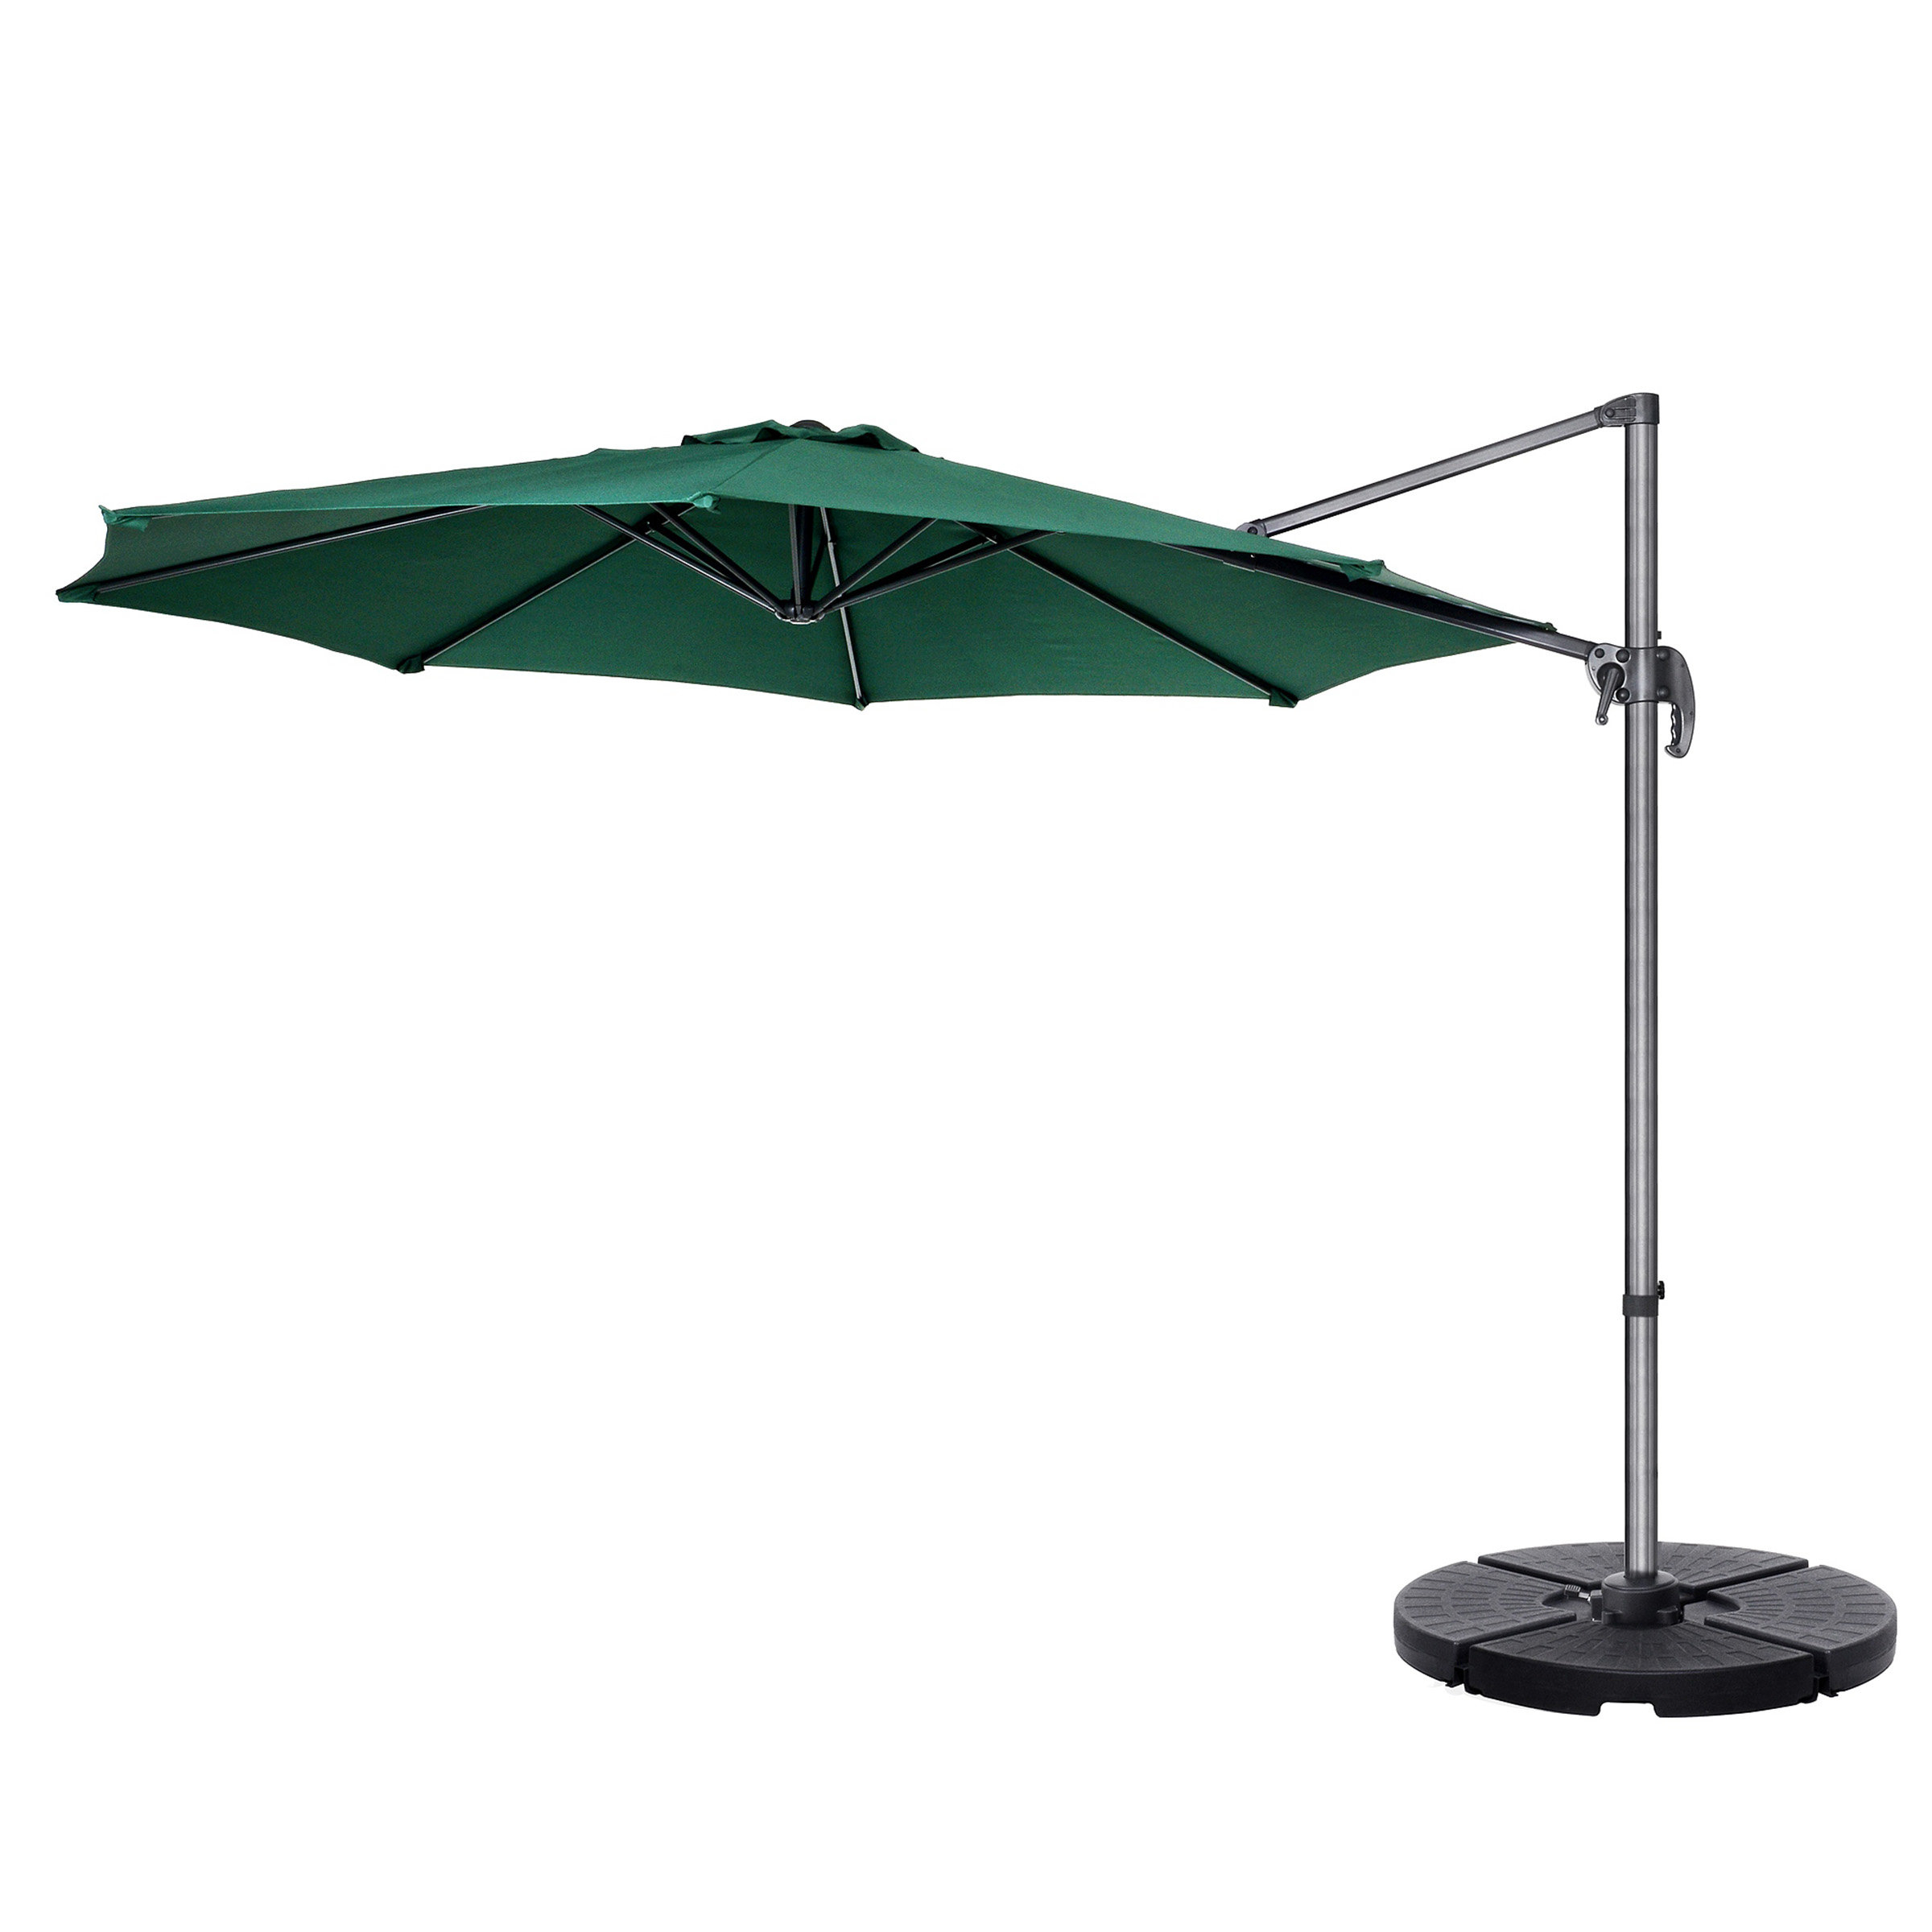 Lytham Cantilever Umbrellas With Famous Freeport Park Cockermouth Rotating 10' Cantilever Umbrella (View 10 of 20)